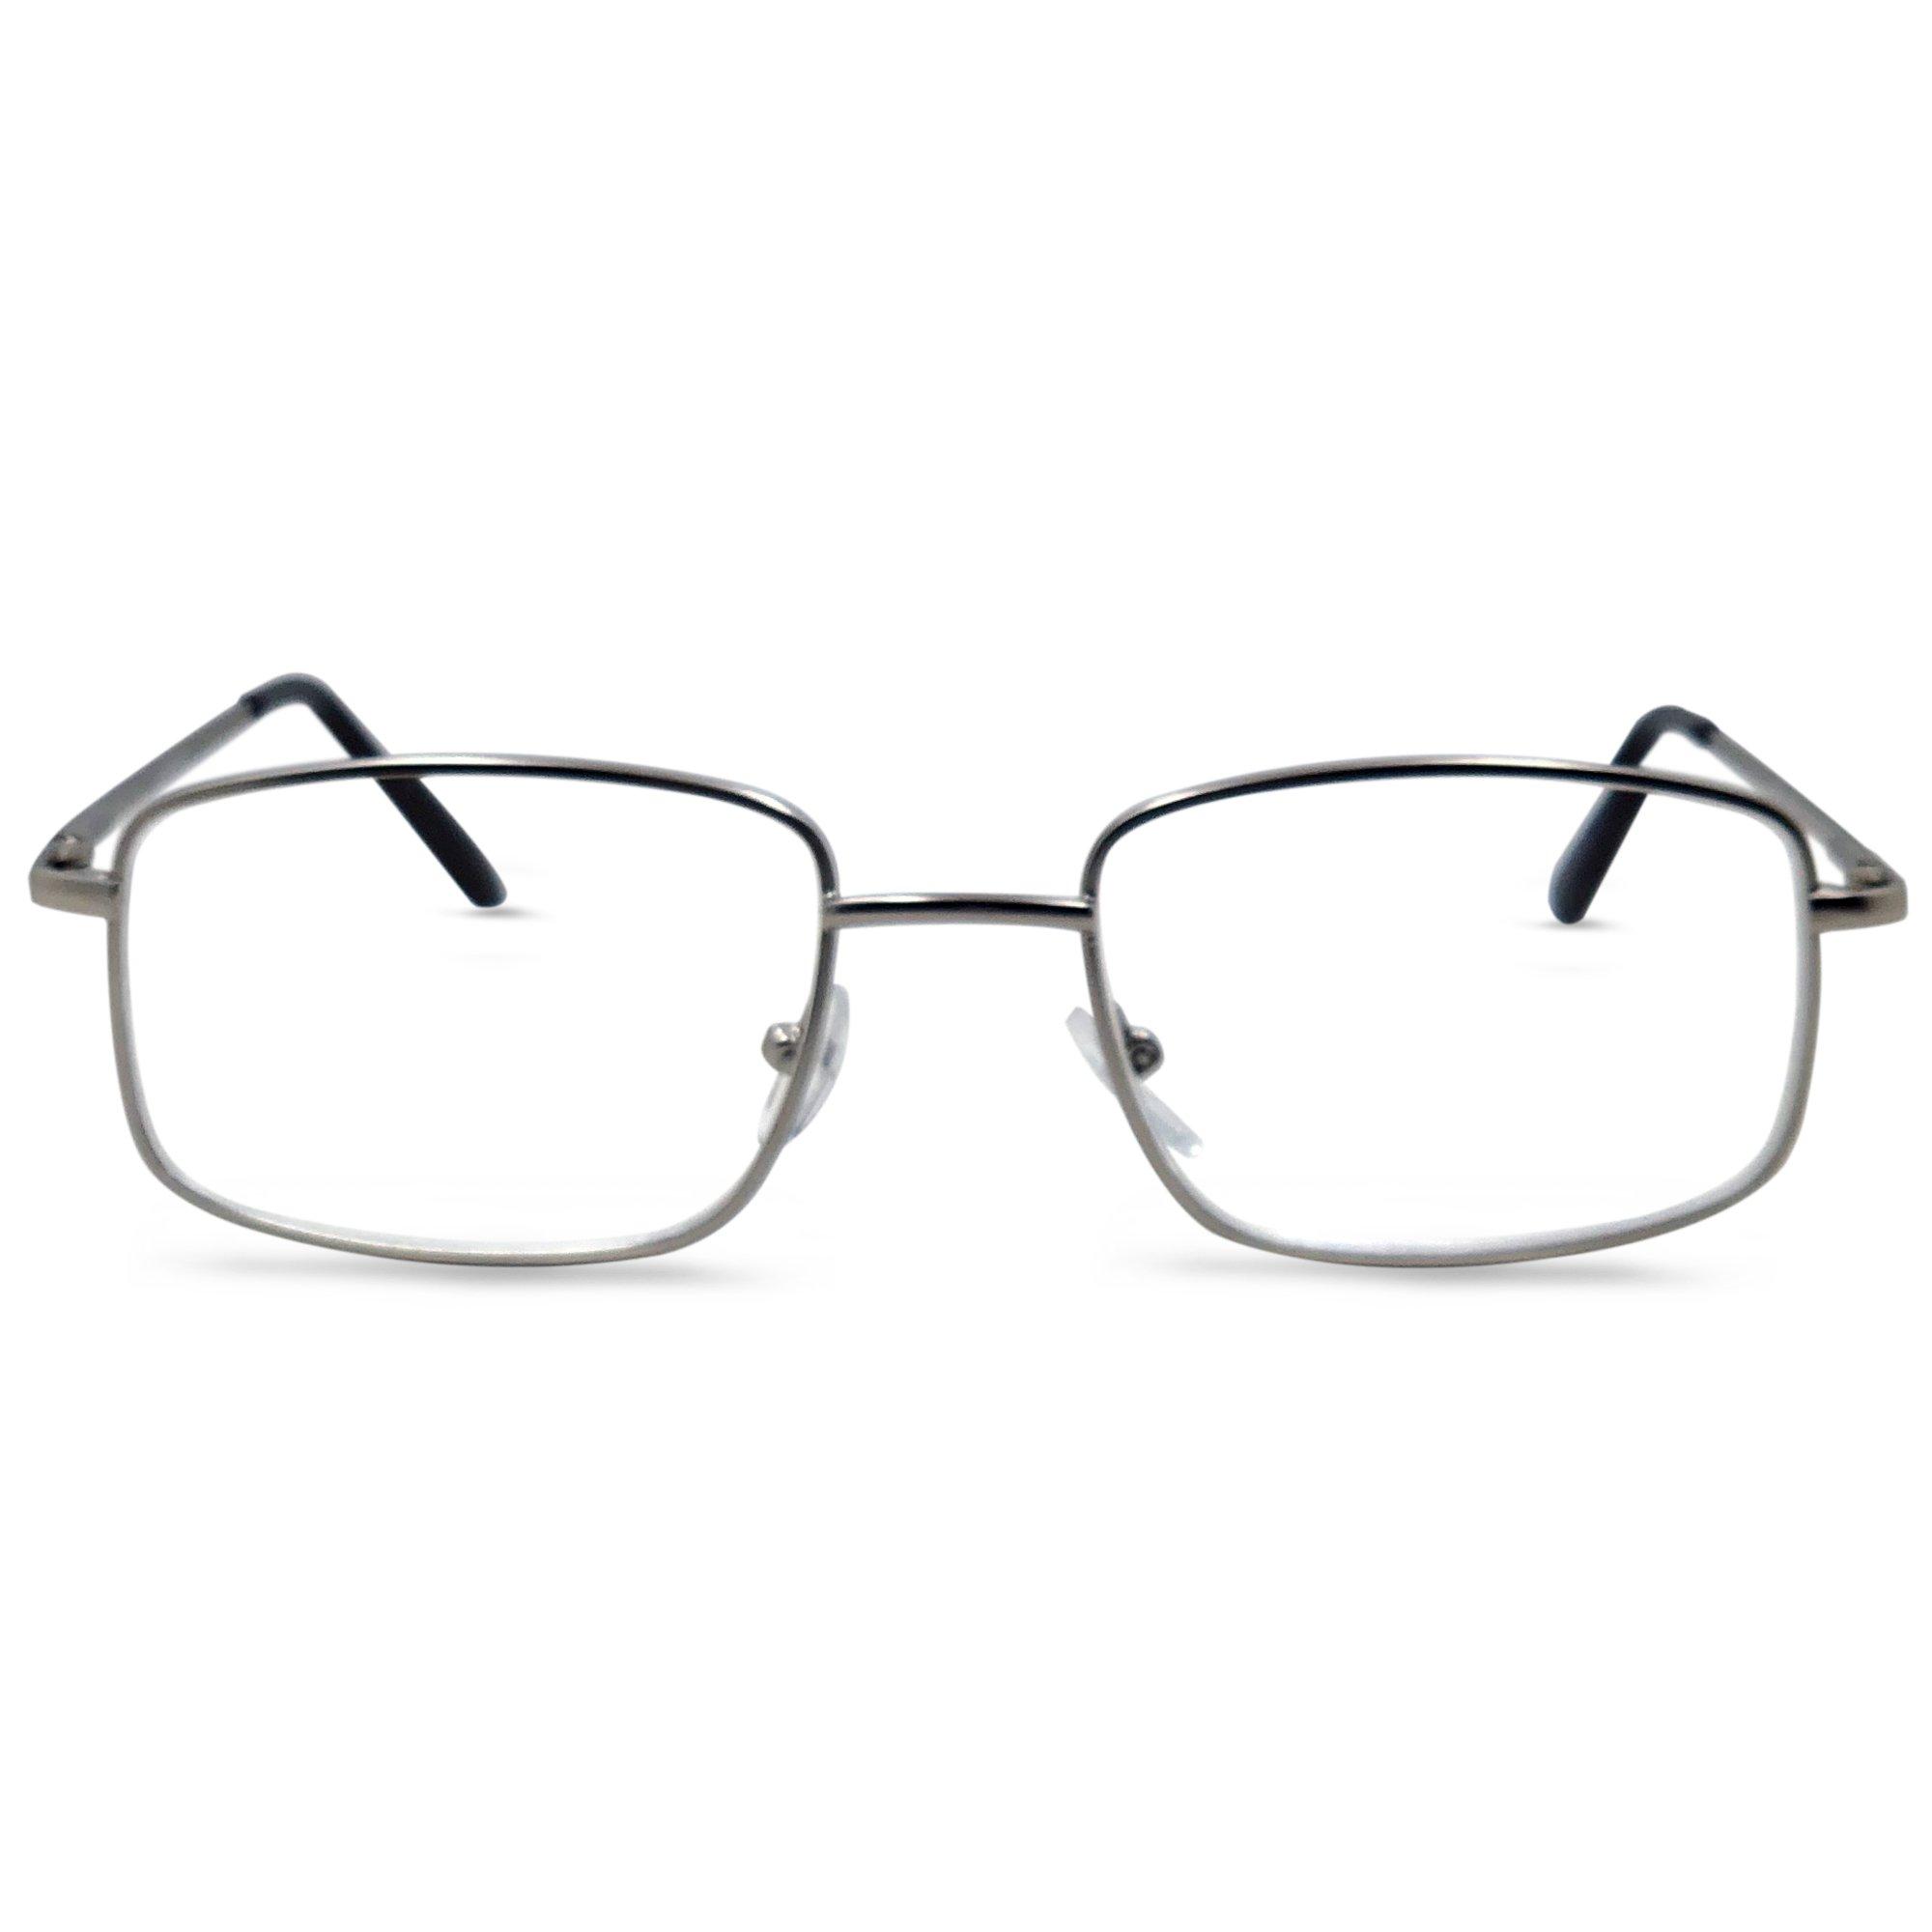 The Boston Reading Glasses (Silver, 2.50)